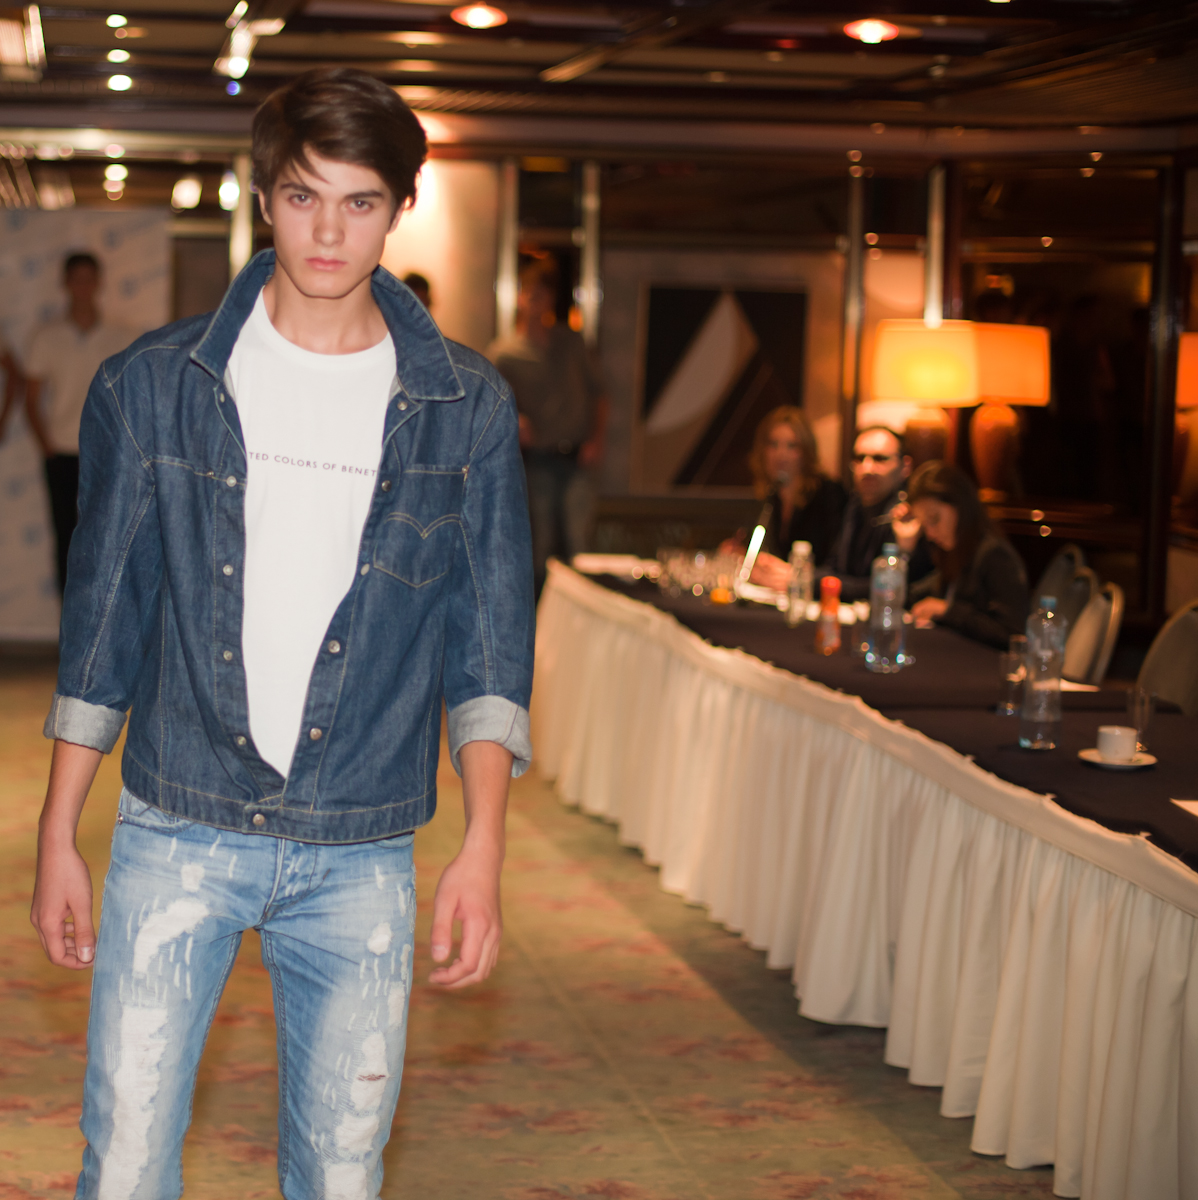 mg 9318 Kasting: Belgrade Fashion Week